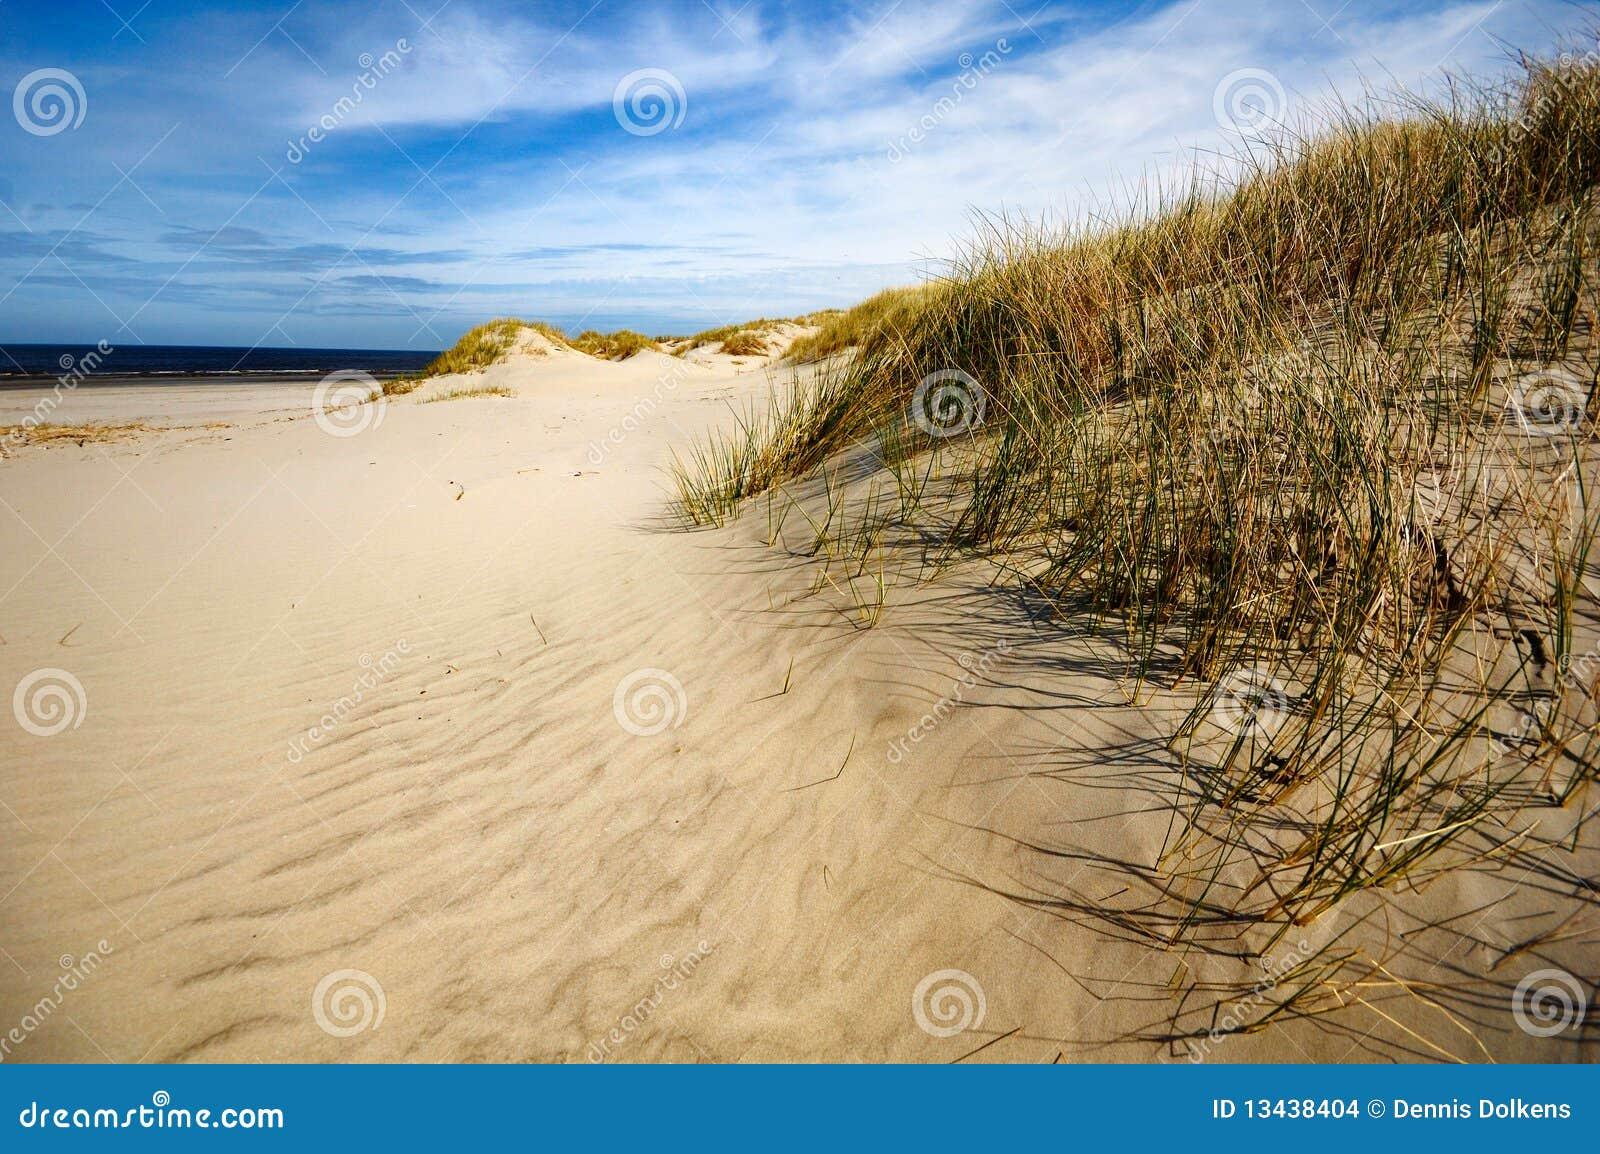 Dunes, Beach and Coast at Ameland, the Netherlands